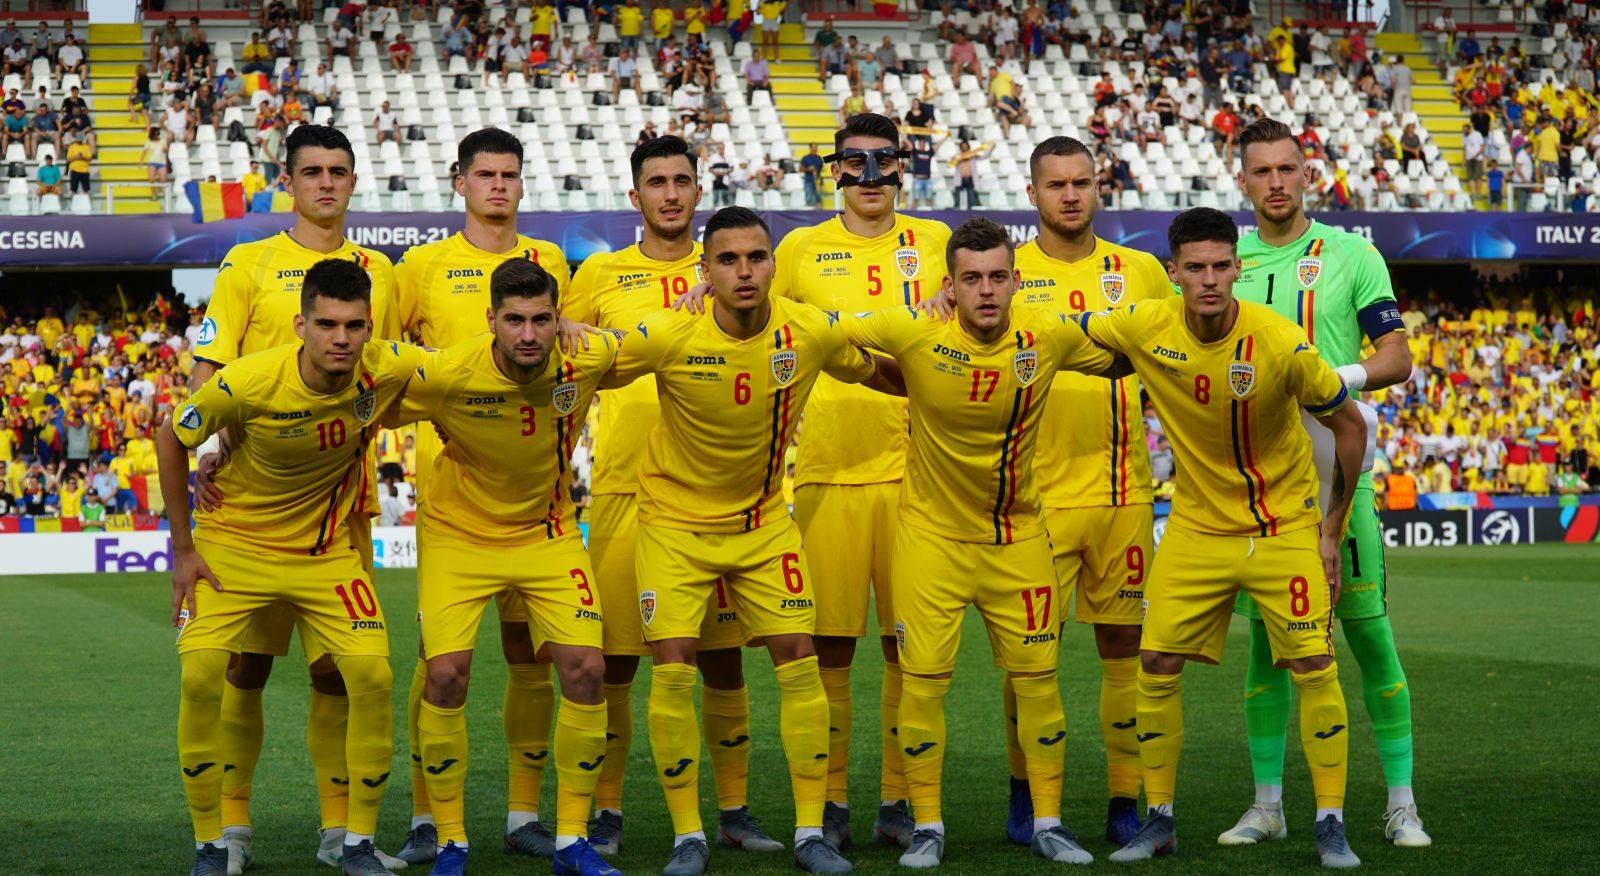 Franța Romania EURO U21 2019 live stream și live scor TVR1